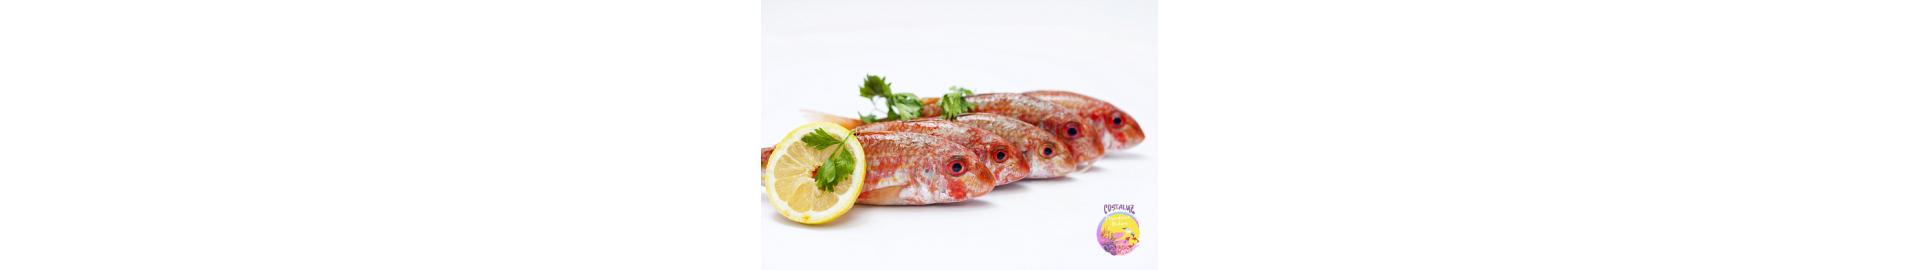 Comprar salmonetes a domicilio